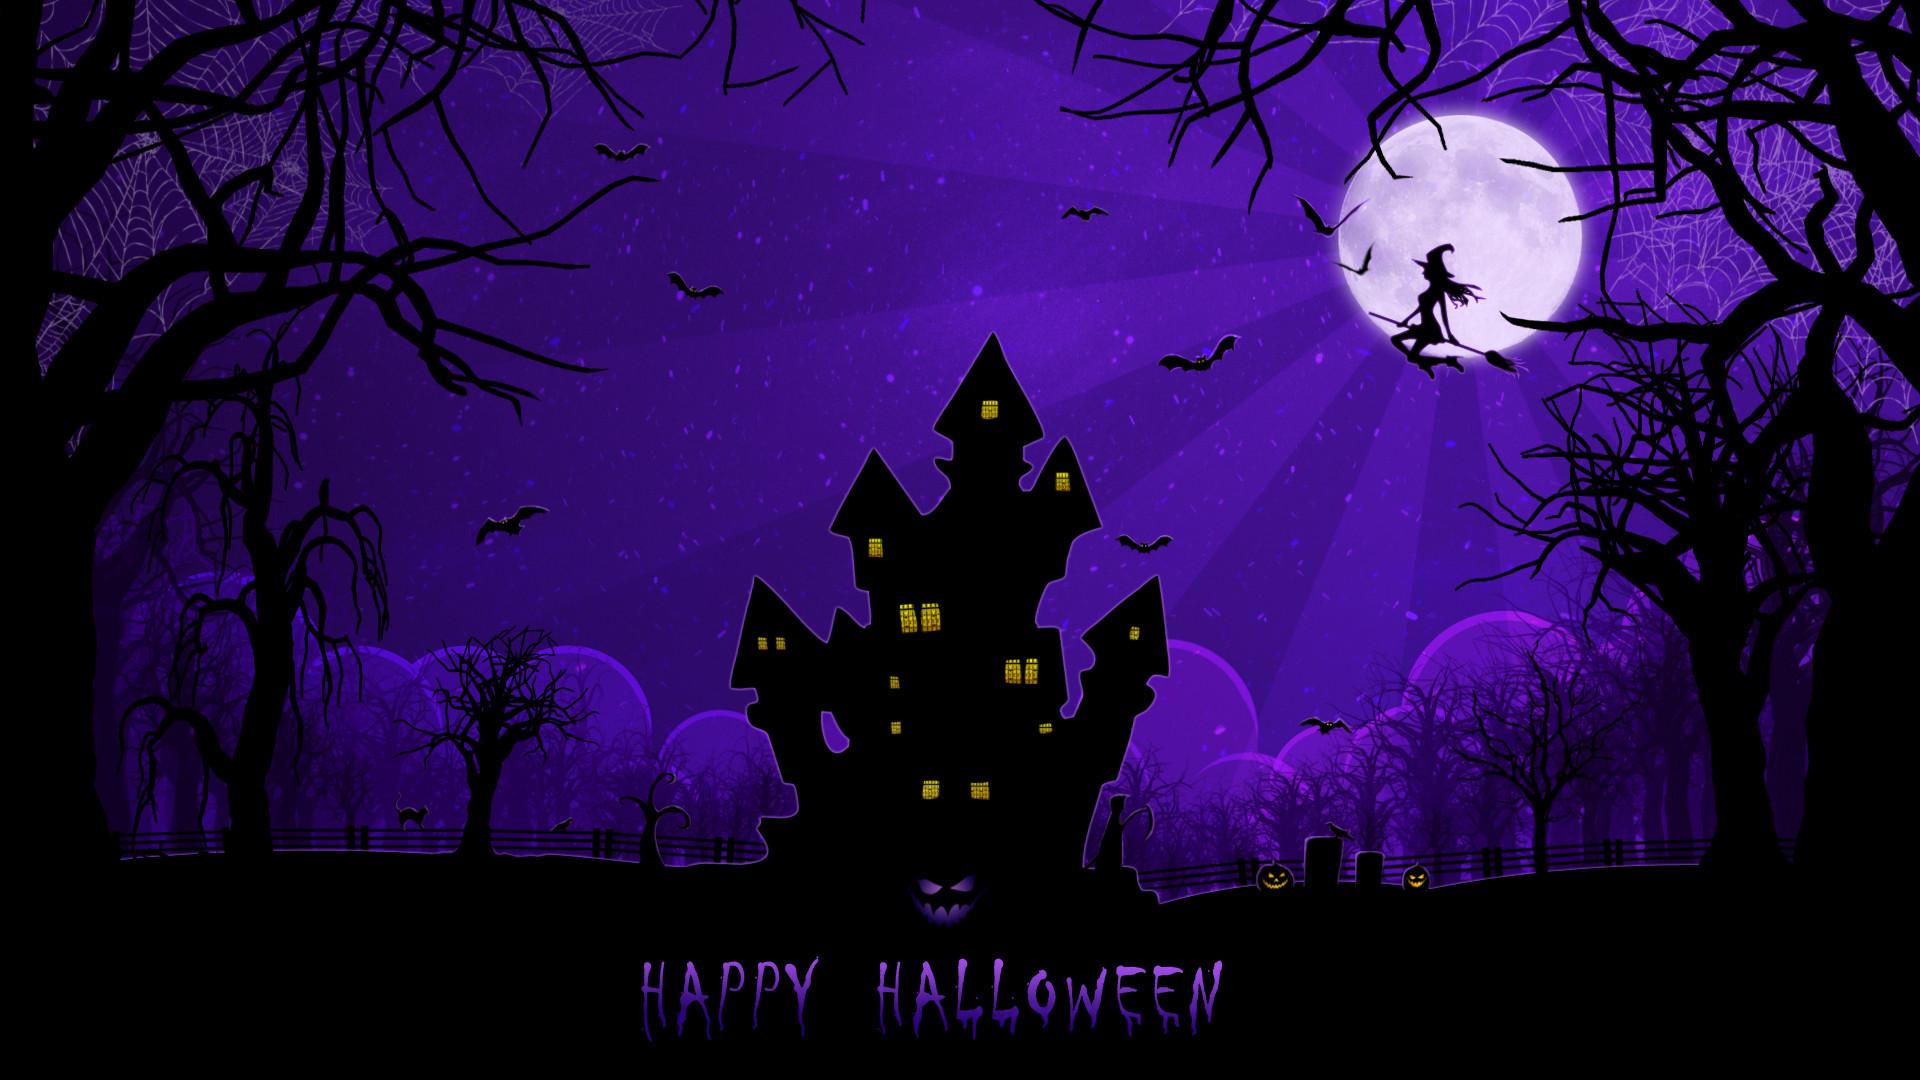 Halloween Wallpaper Background Full HD 1080p 1920x1080 Michael Myers Maniac Killer Knife Mask Fear Horror